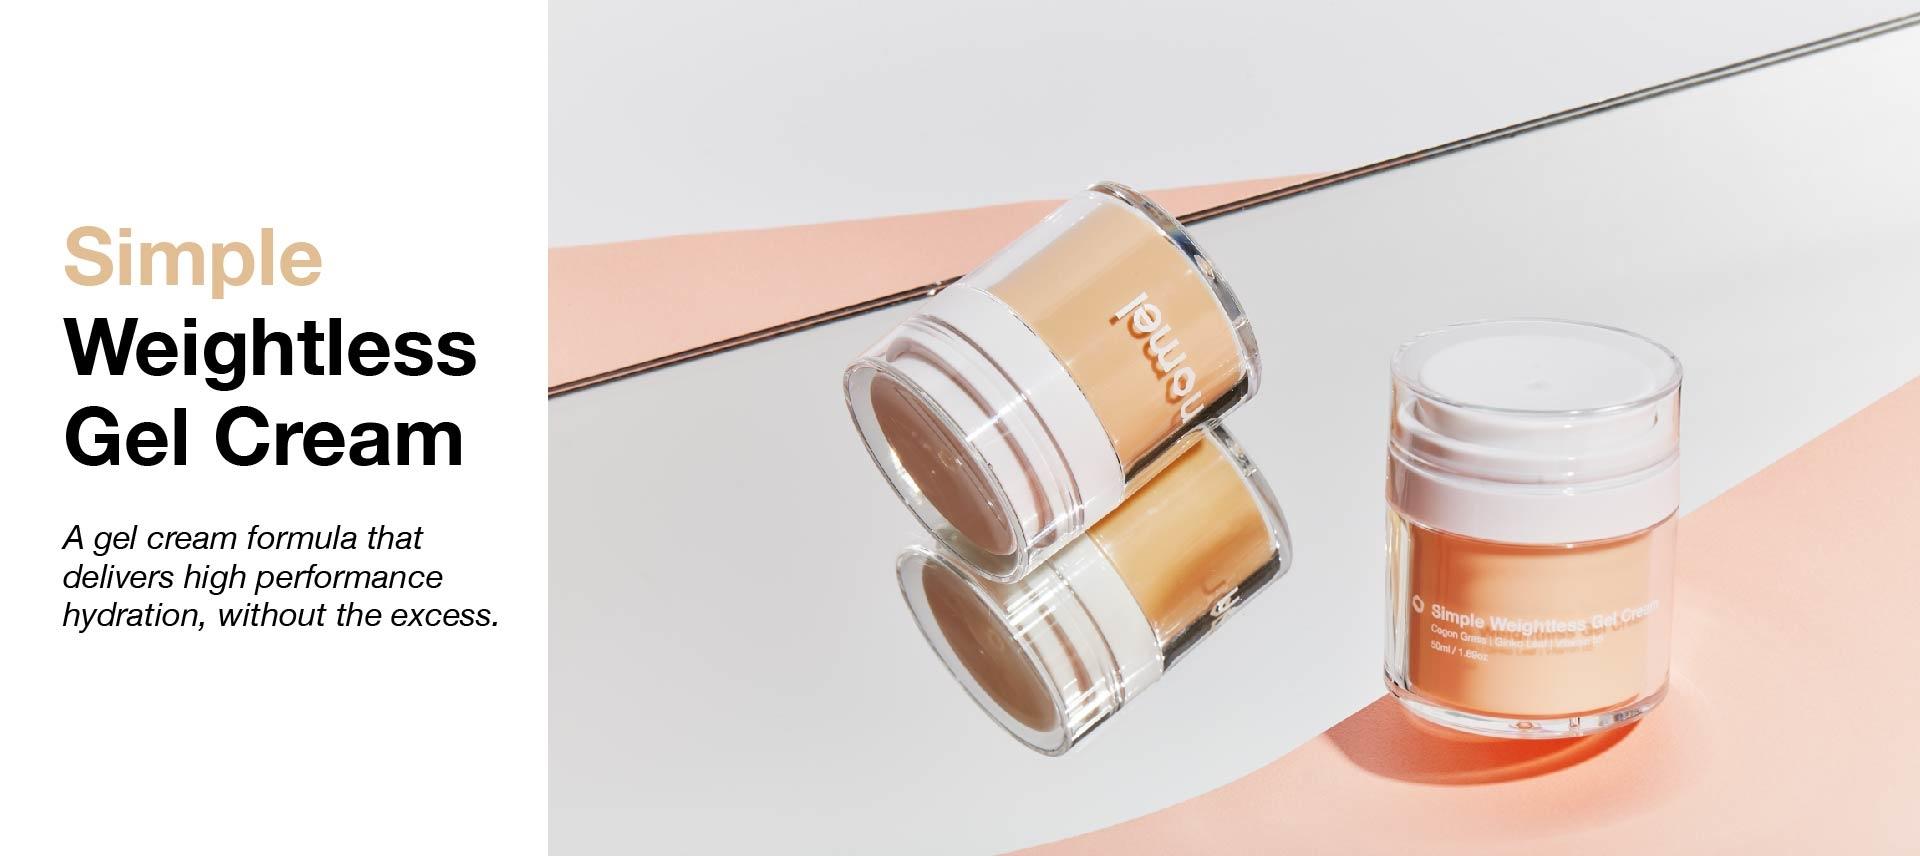 Shop Simple Weightless Gel Cream